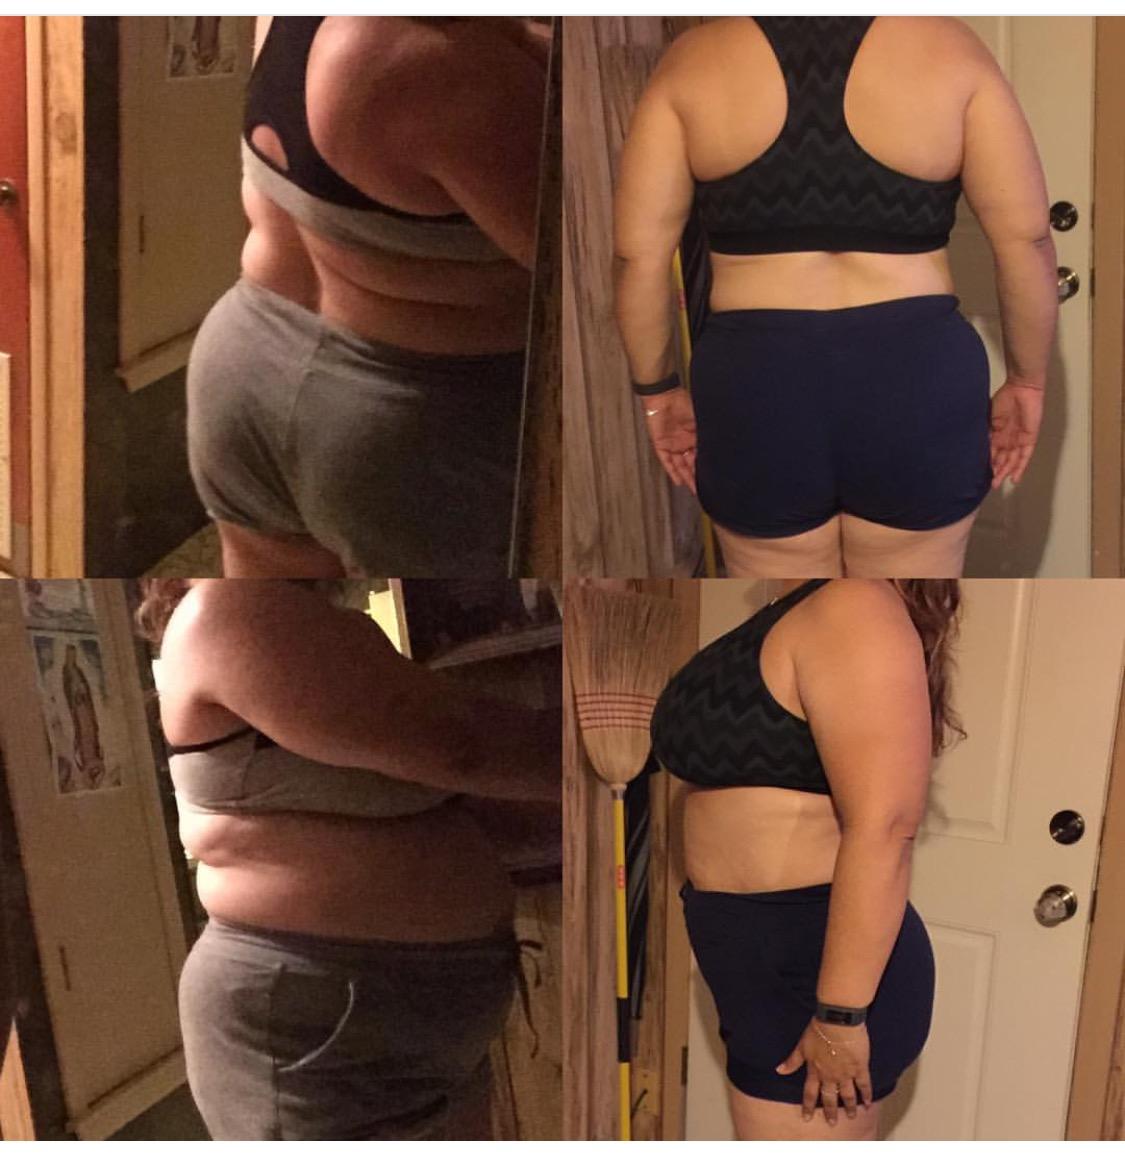 3 month progress